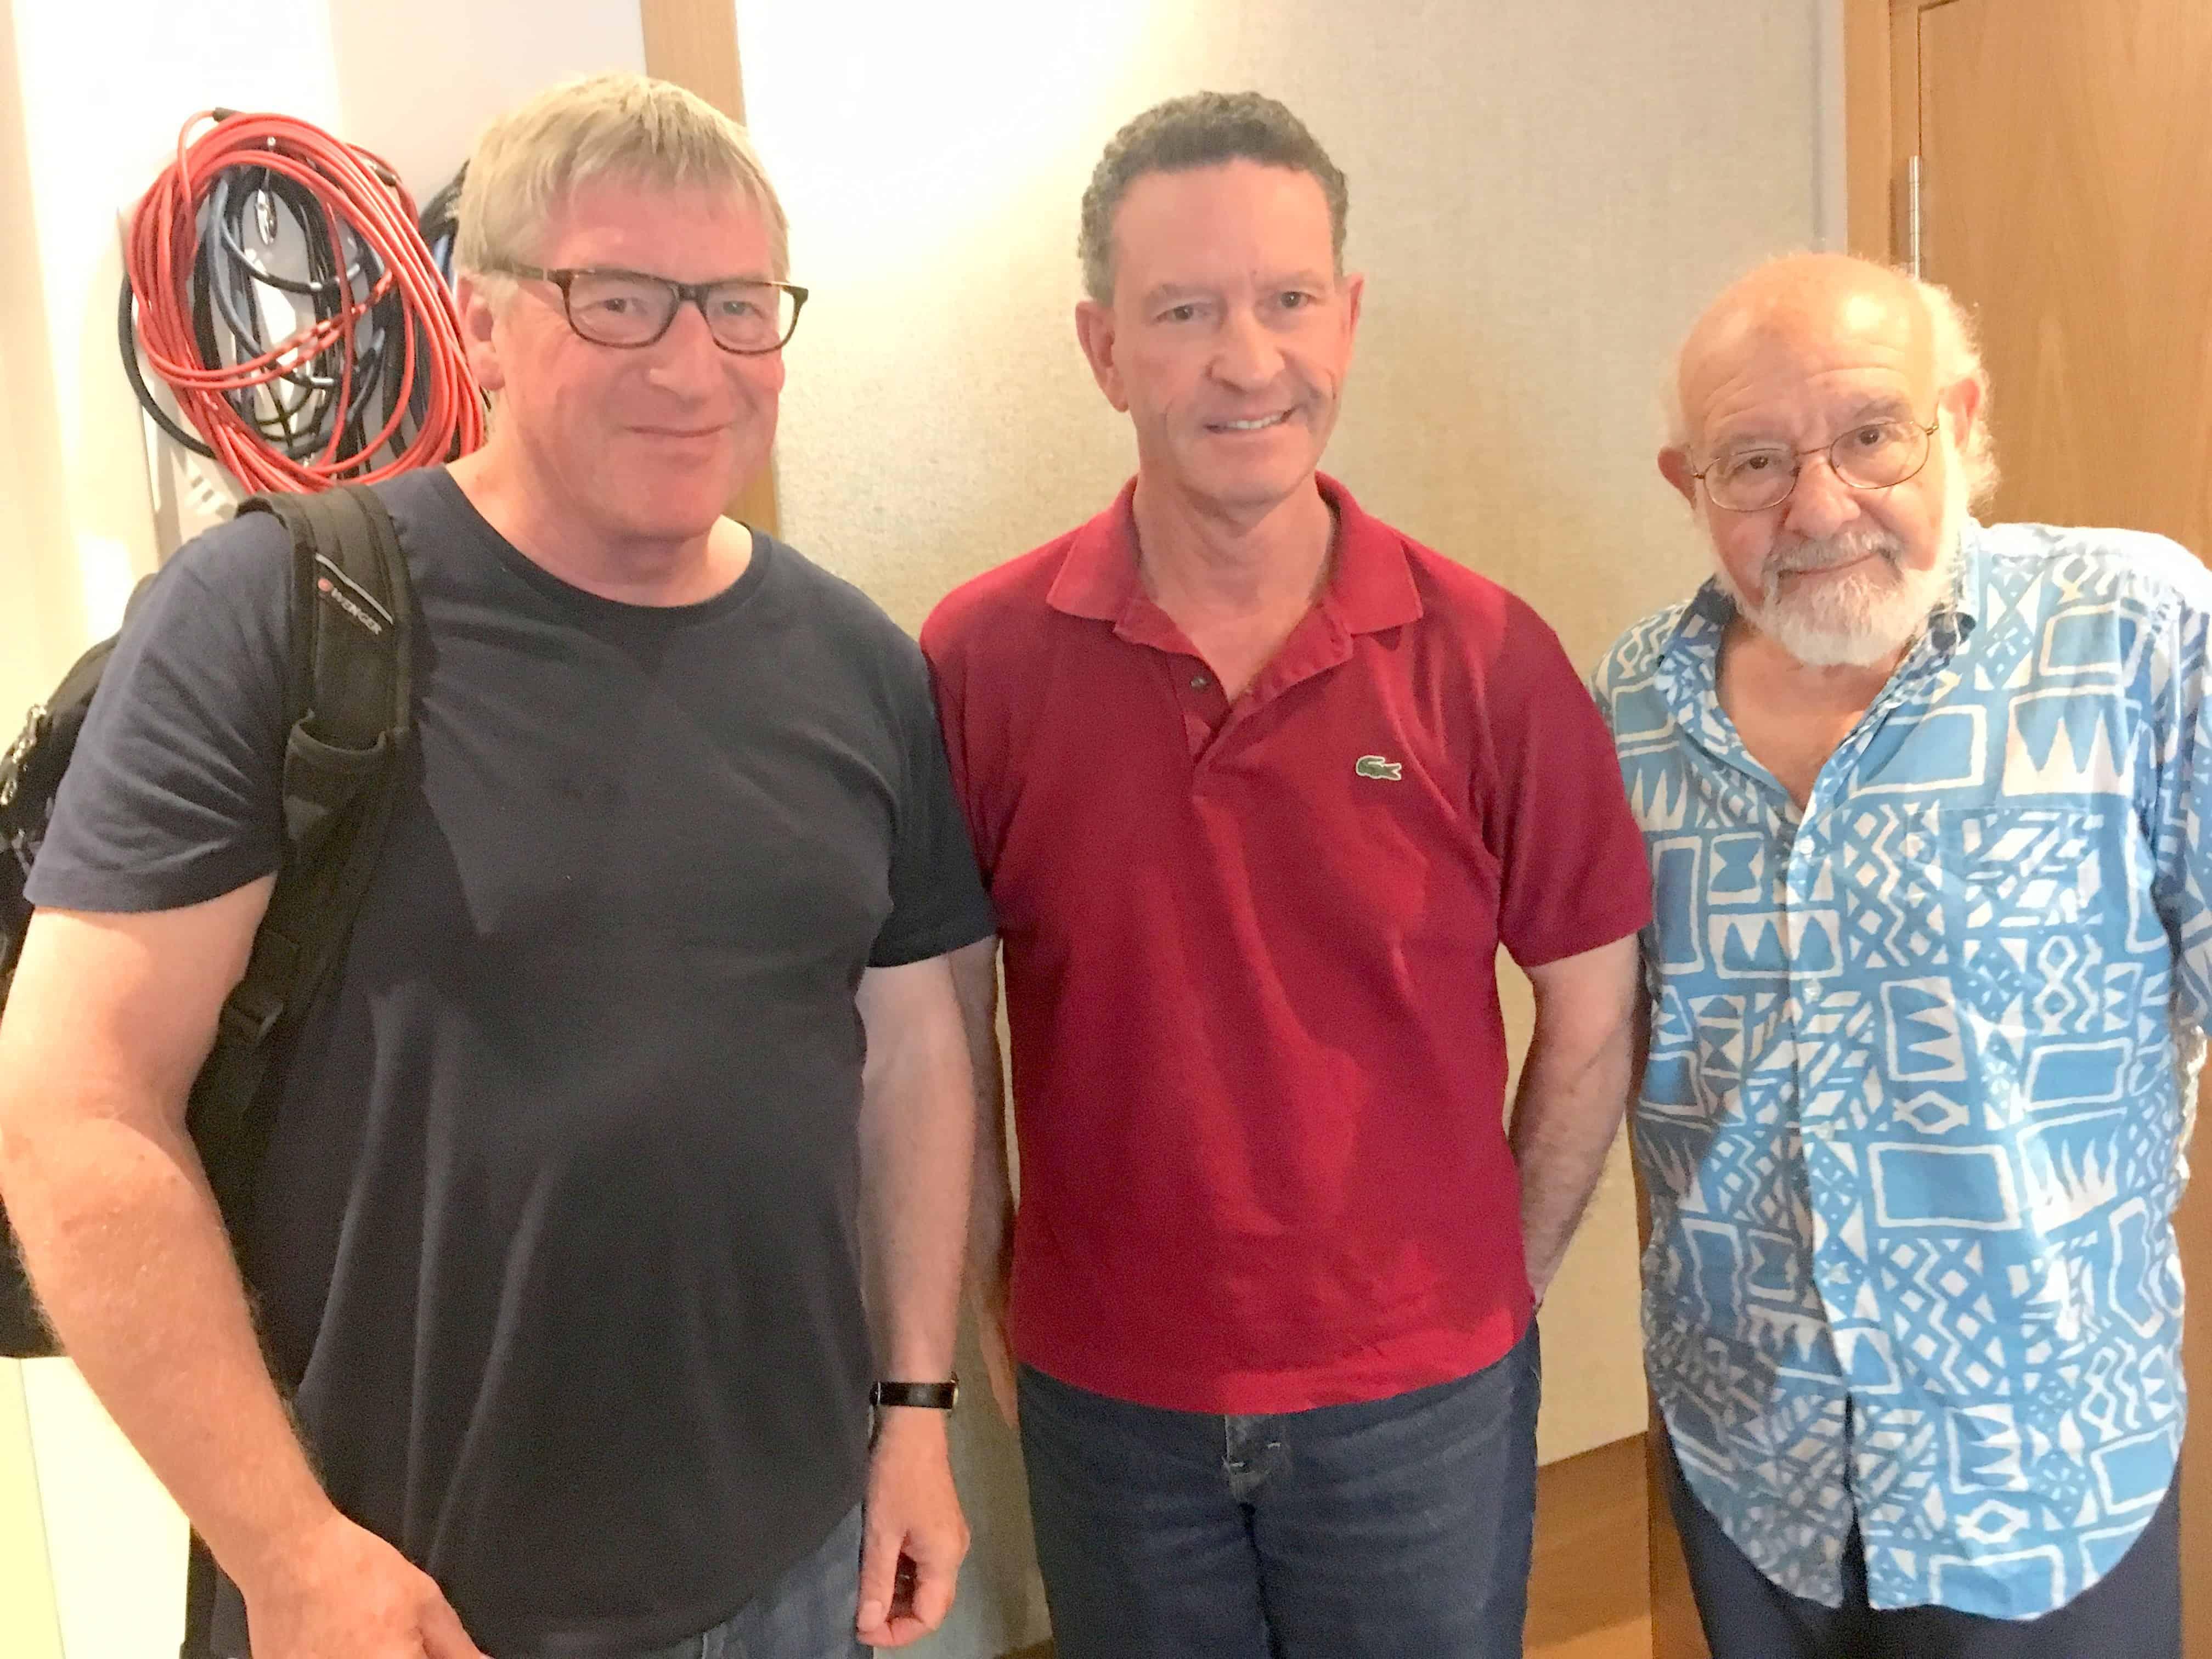 David Temple, Nick Palmer and Walter Simmons